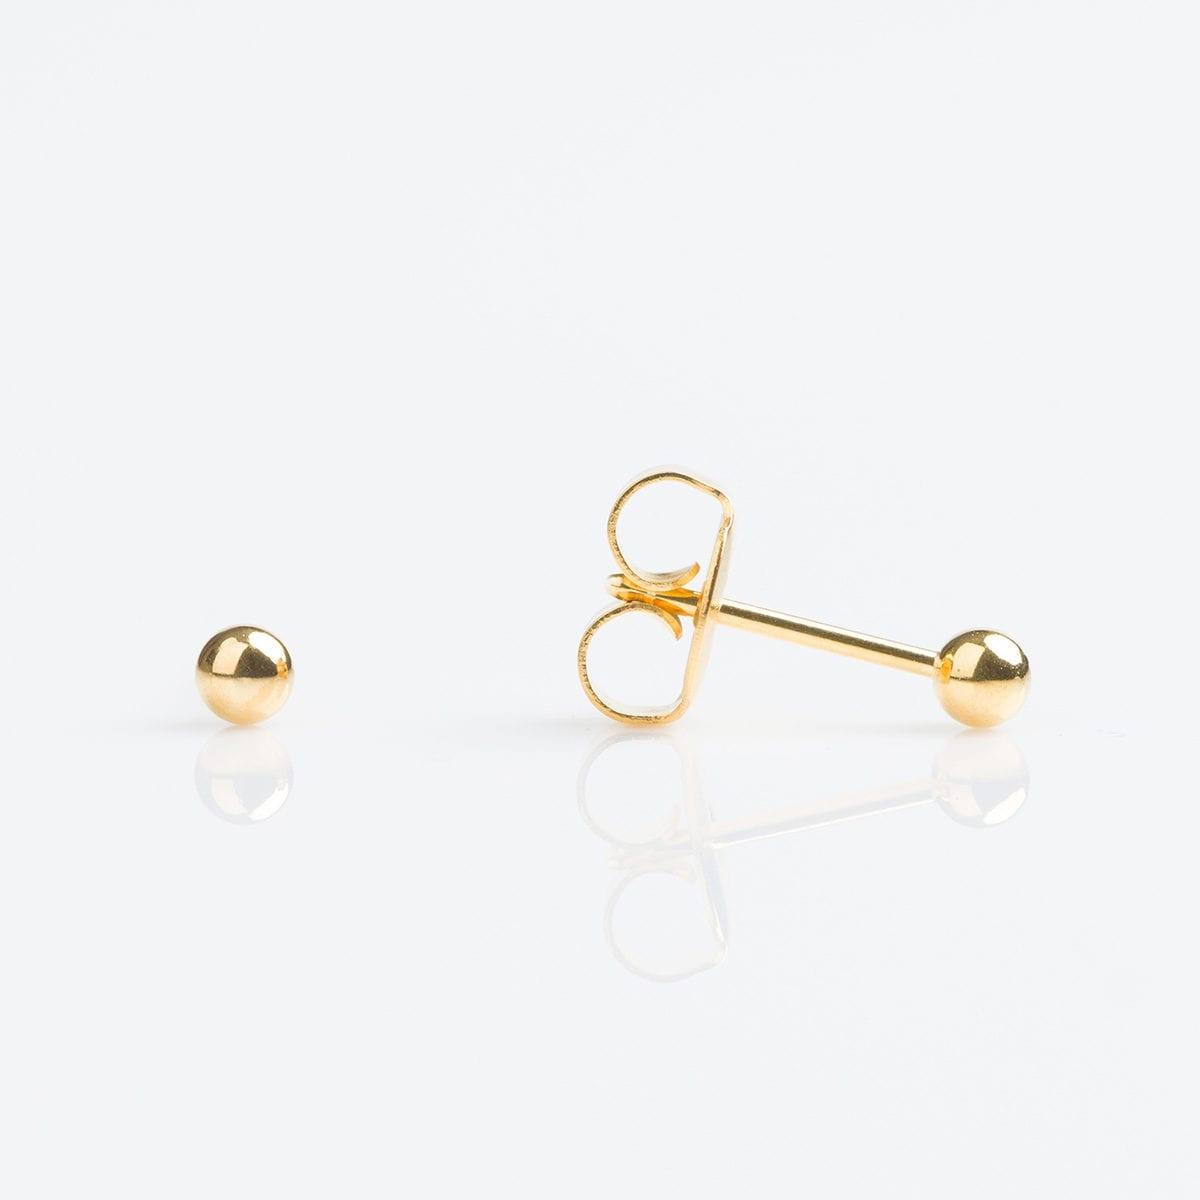 tiny-tips-3mm-gold-ball